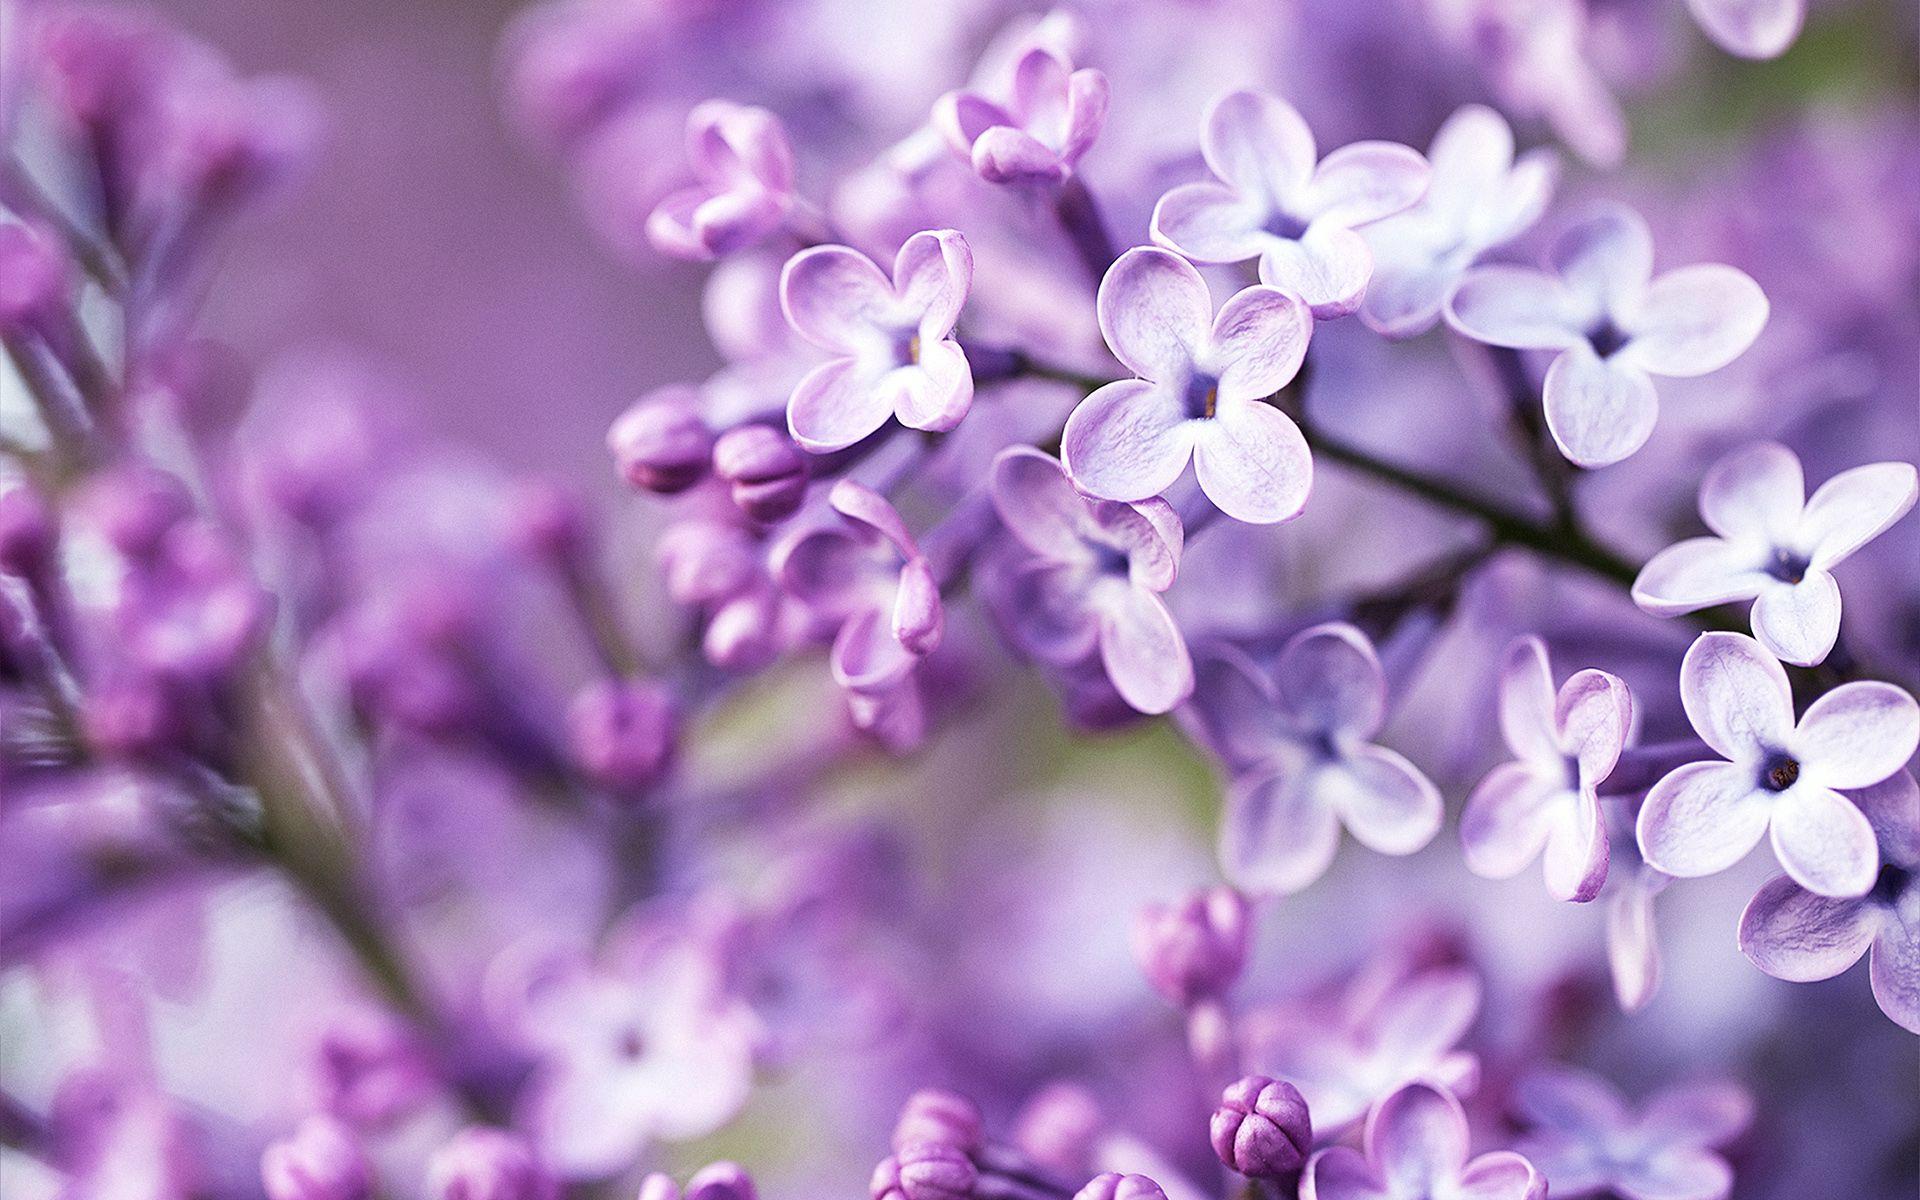 Lilac Wallpapers, Creative Lilac Wallpapers - #WP:YFS914 GuoGuiyan ...